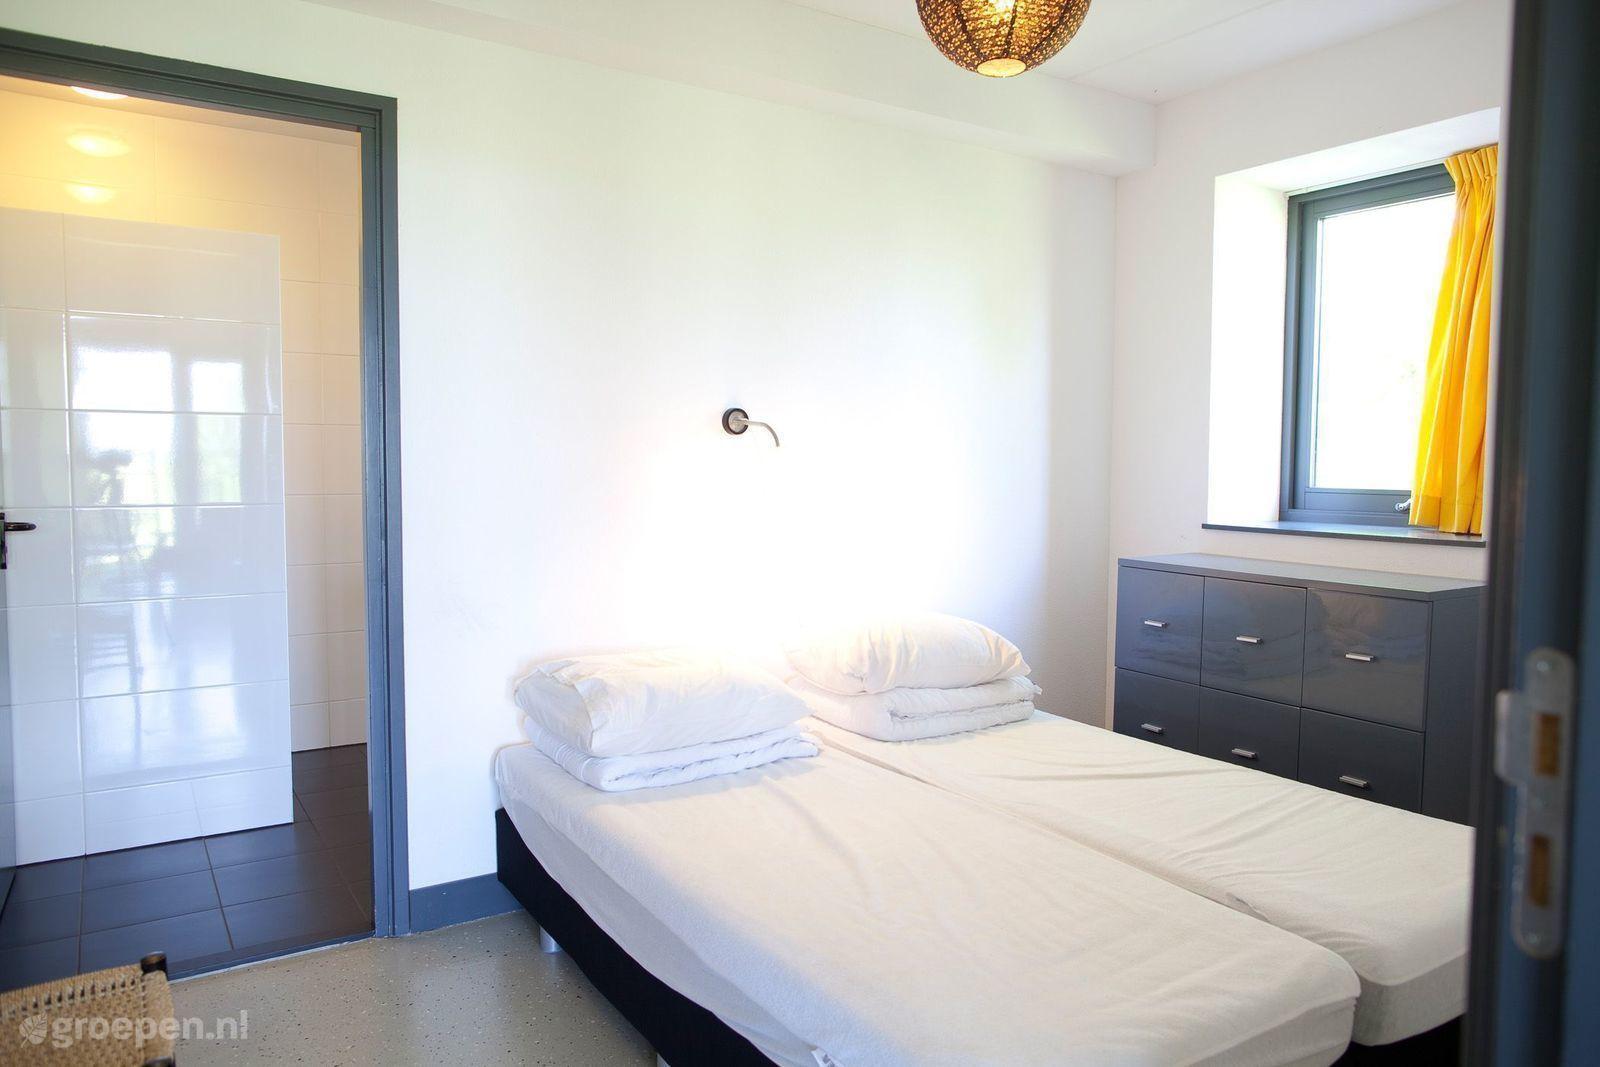 Groepsaccommodatie Waarland - Nederland - Noord-Holland - 30 personen - slaapkamer